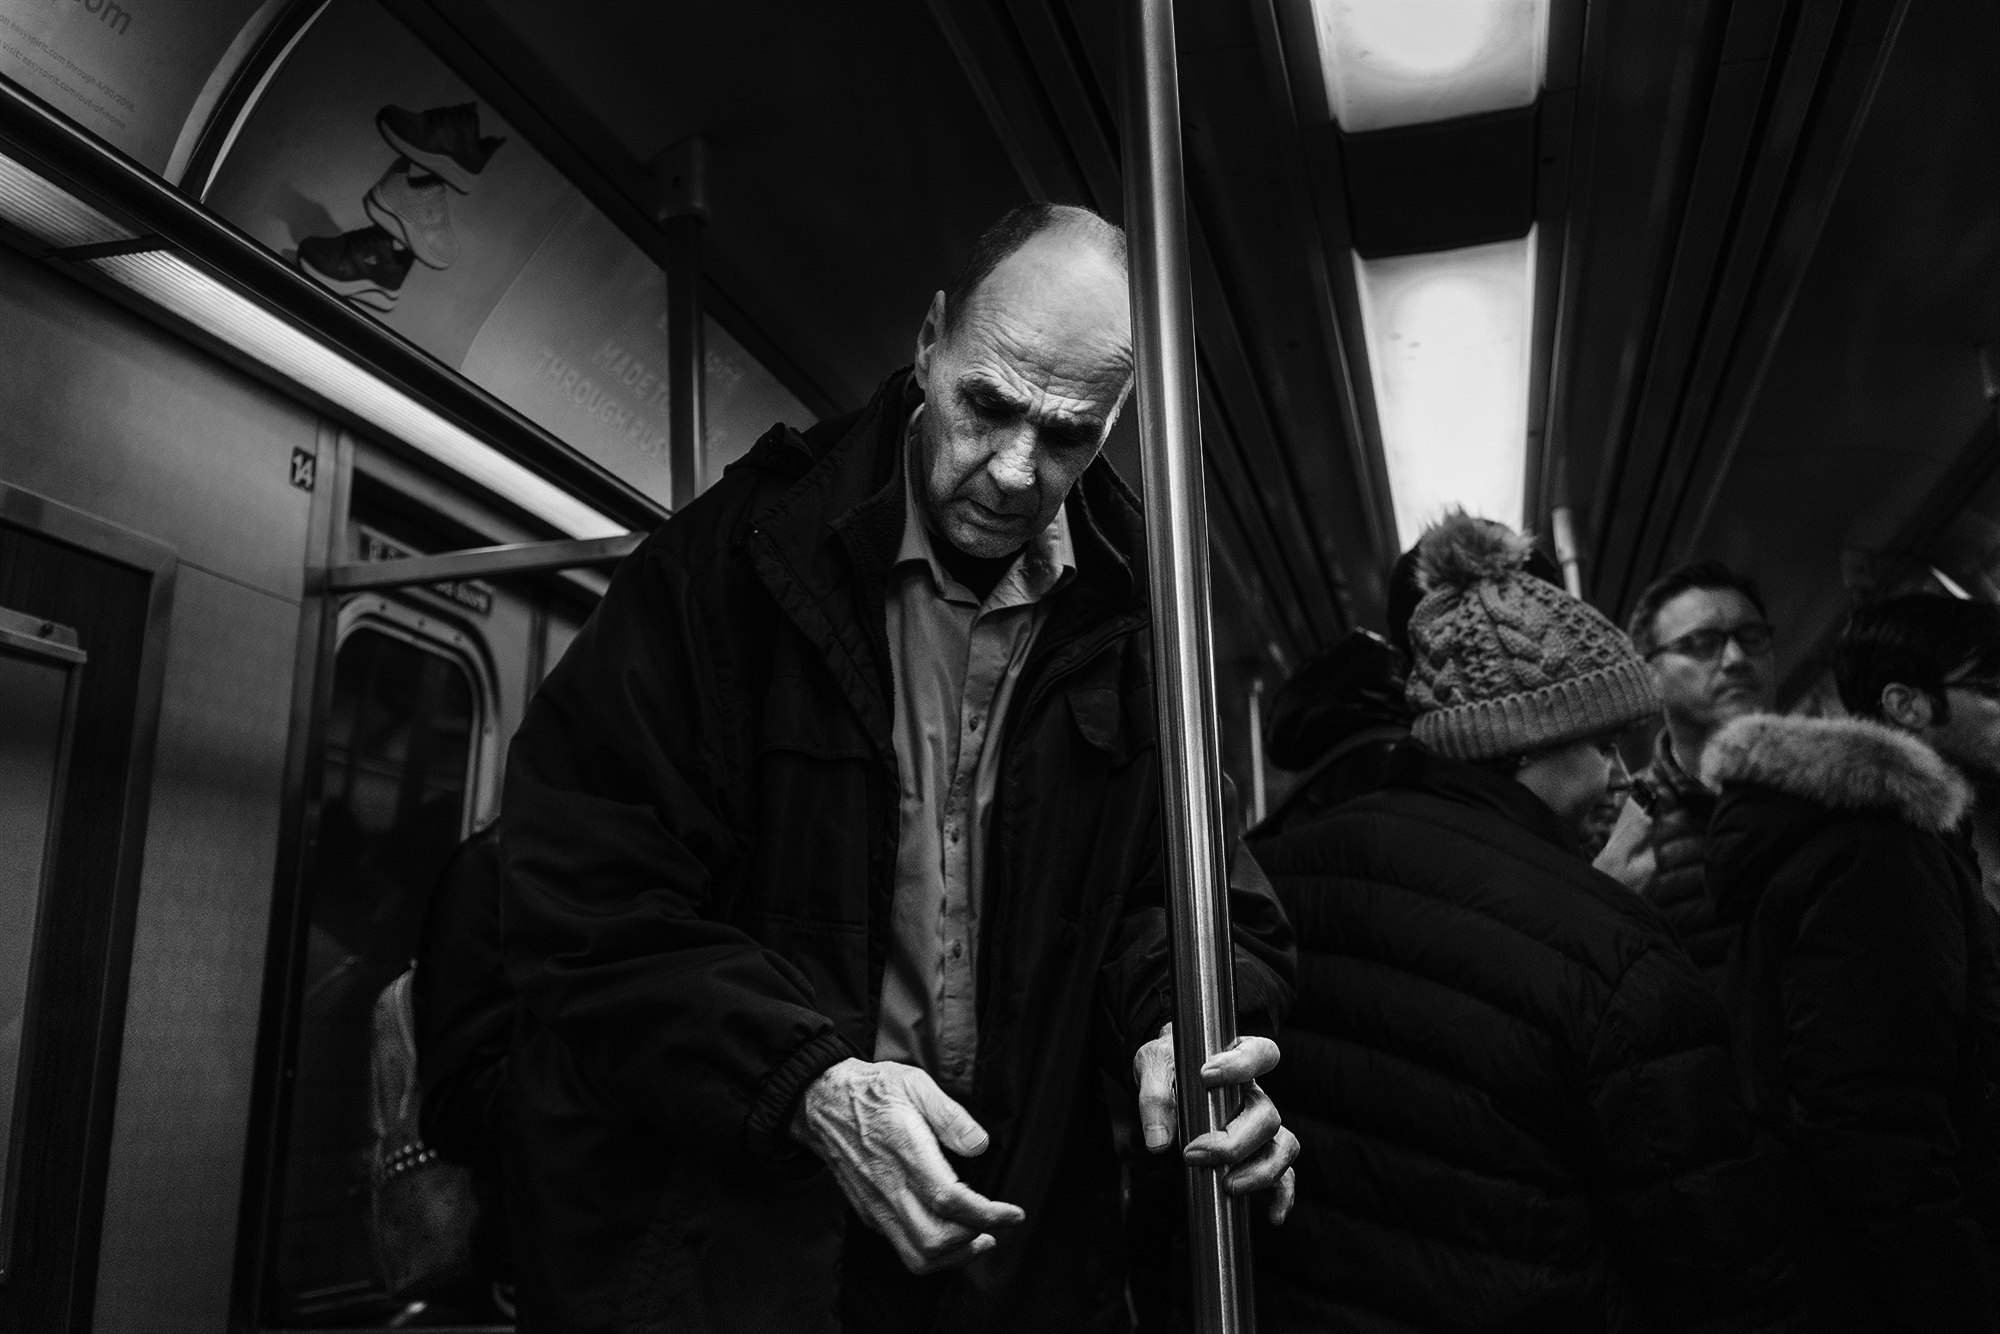 Brklyn_Subway_2018_Large_Hands_Man-005.jpg